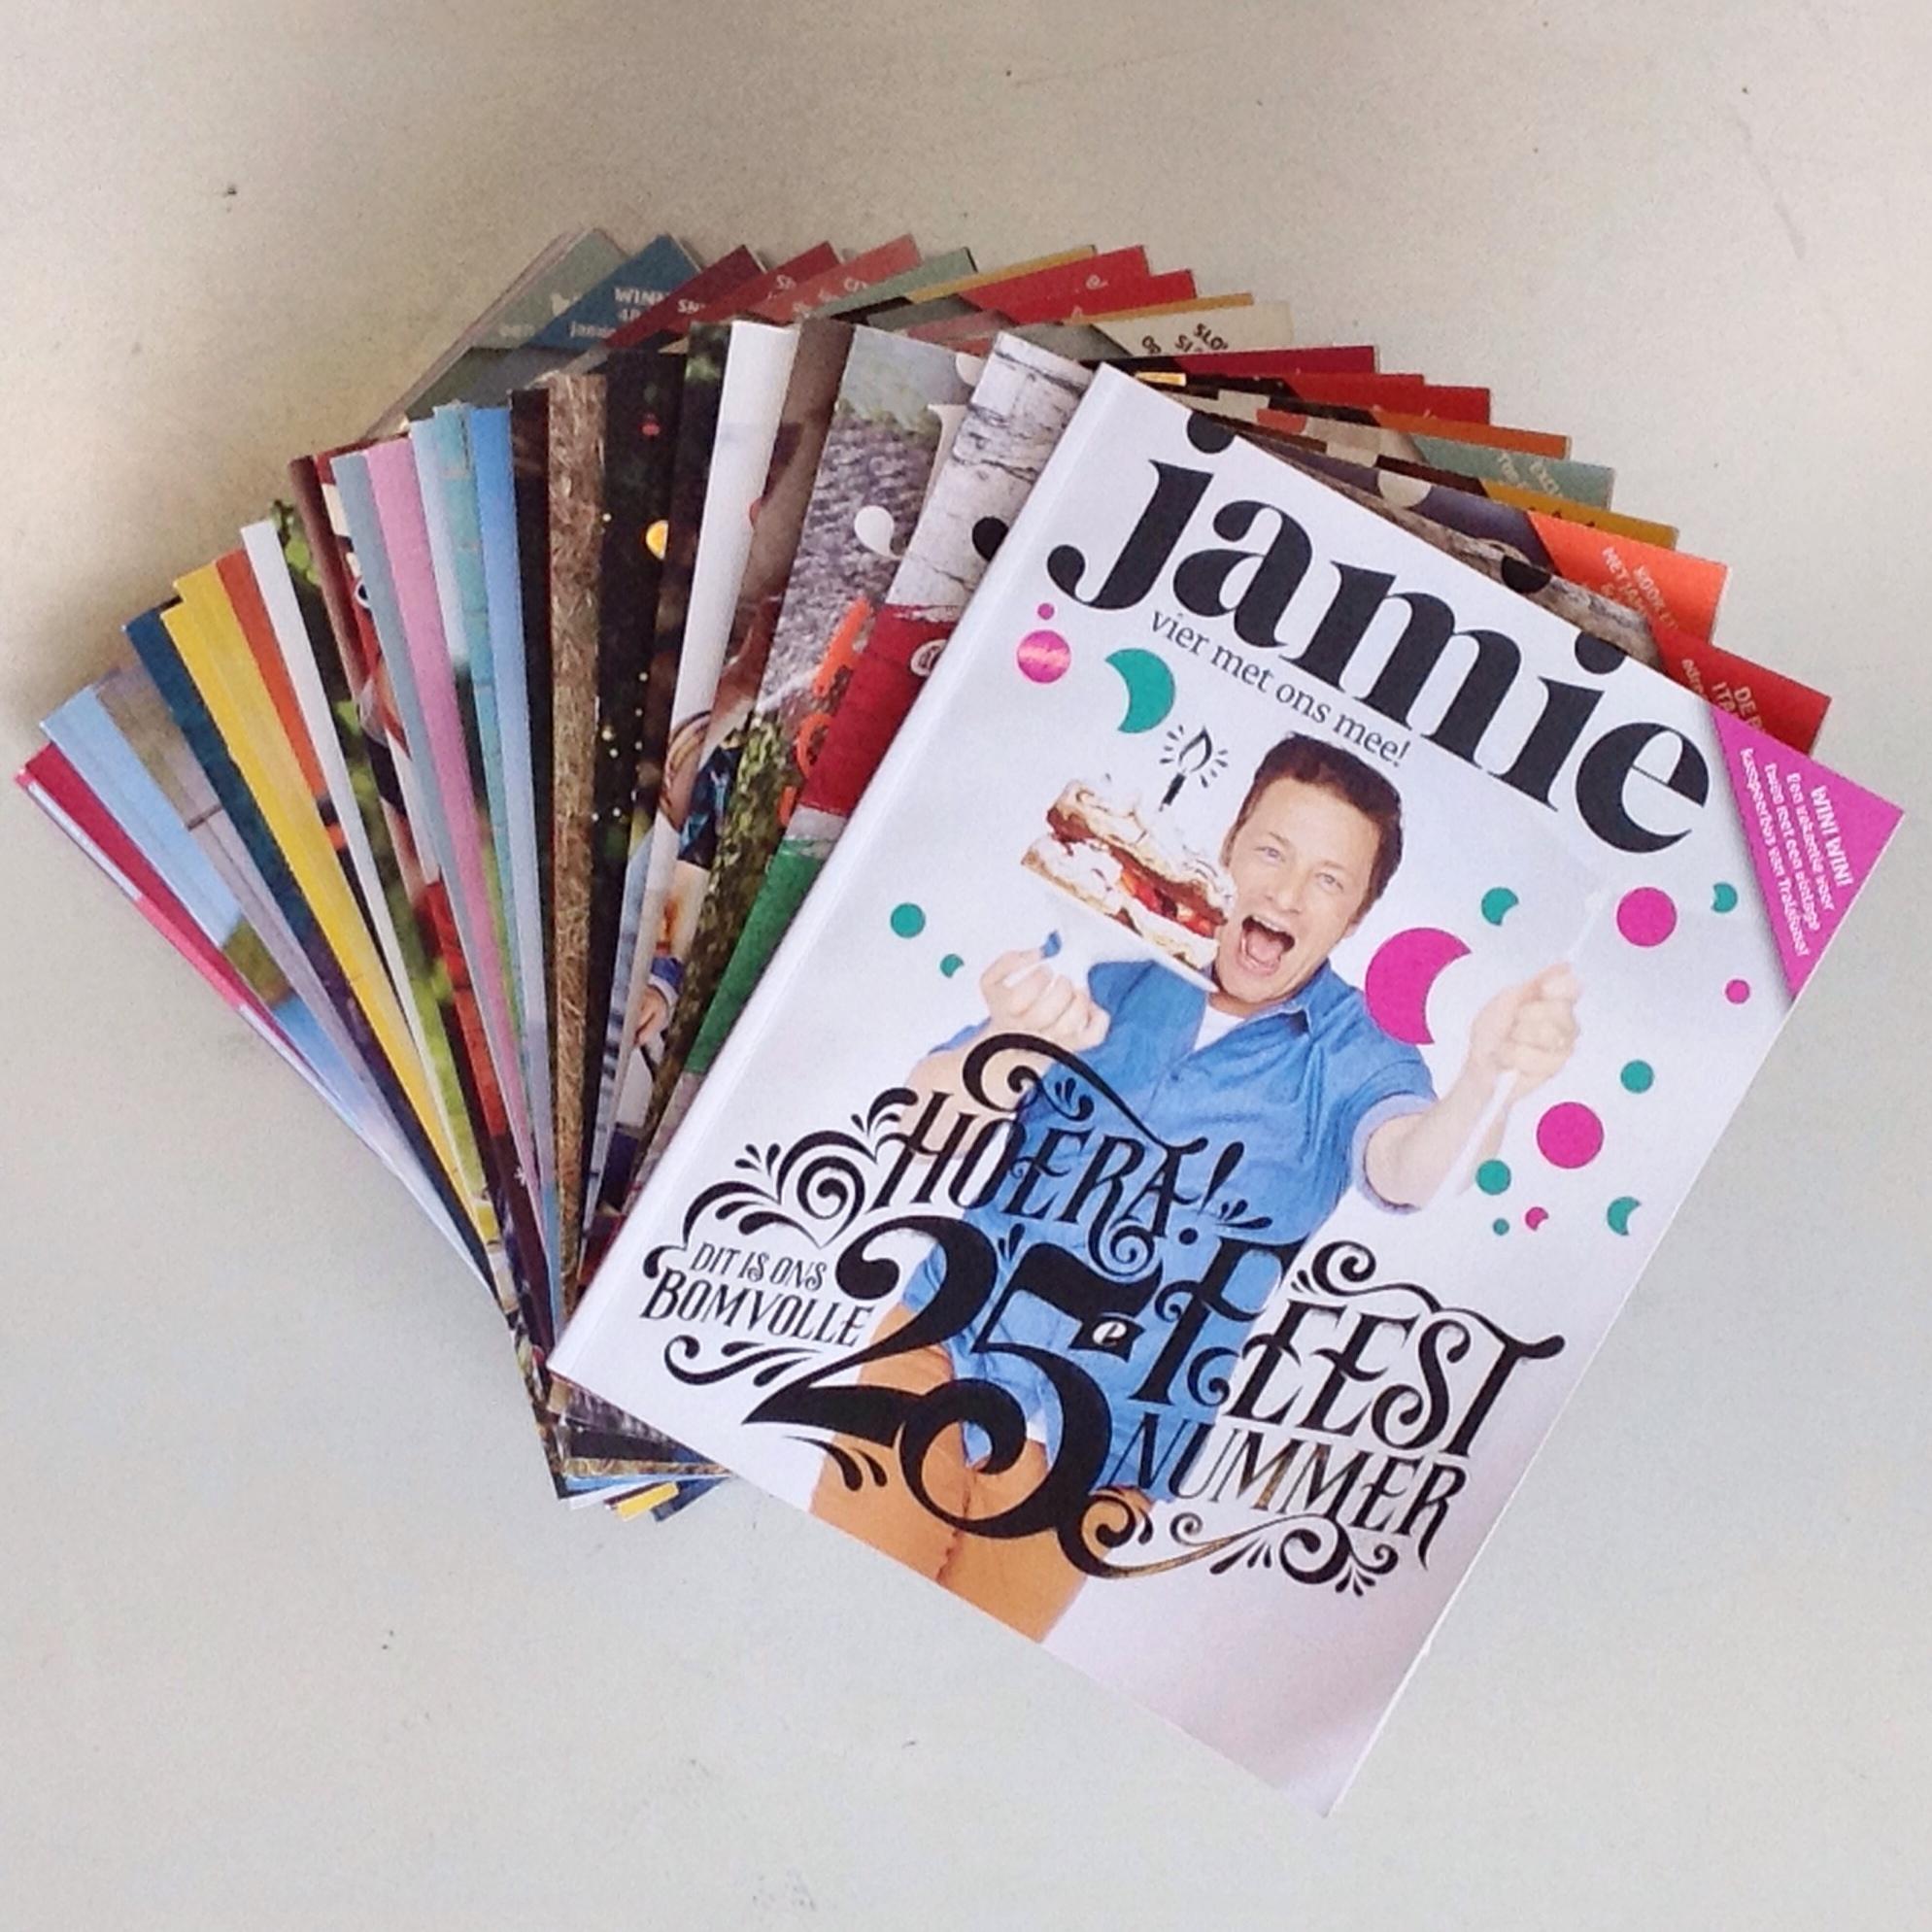 JM1 25 - Win! Jamie Magazine celebrates its 25th issue